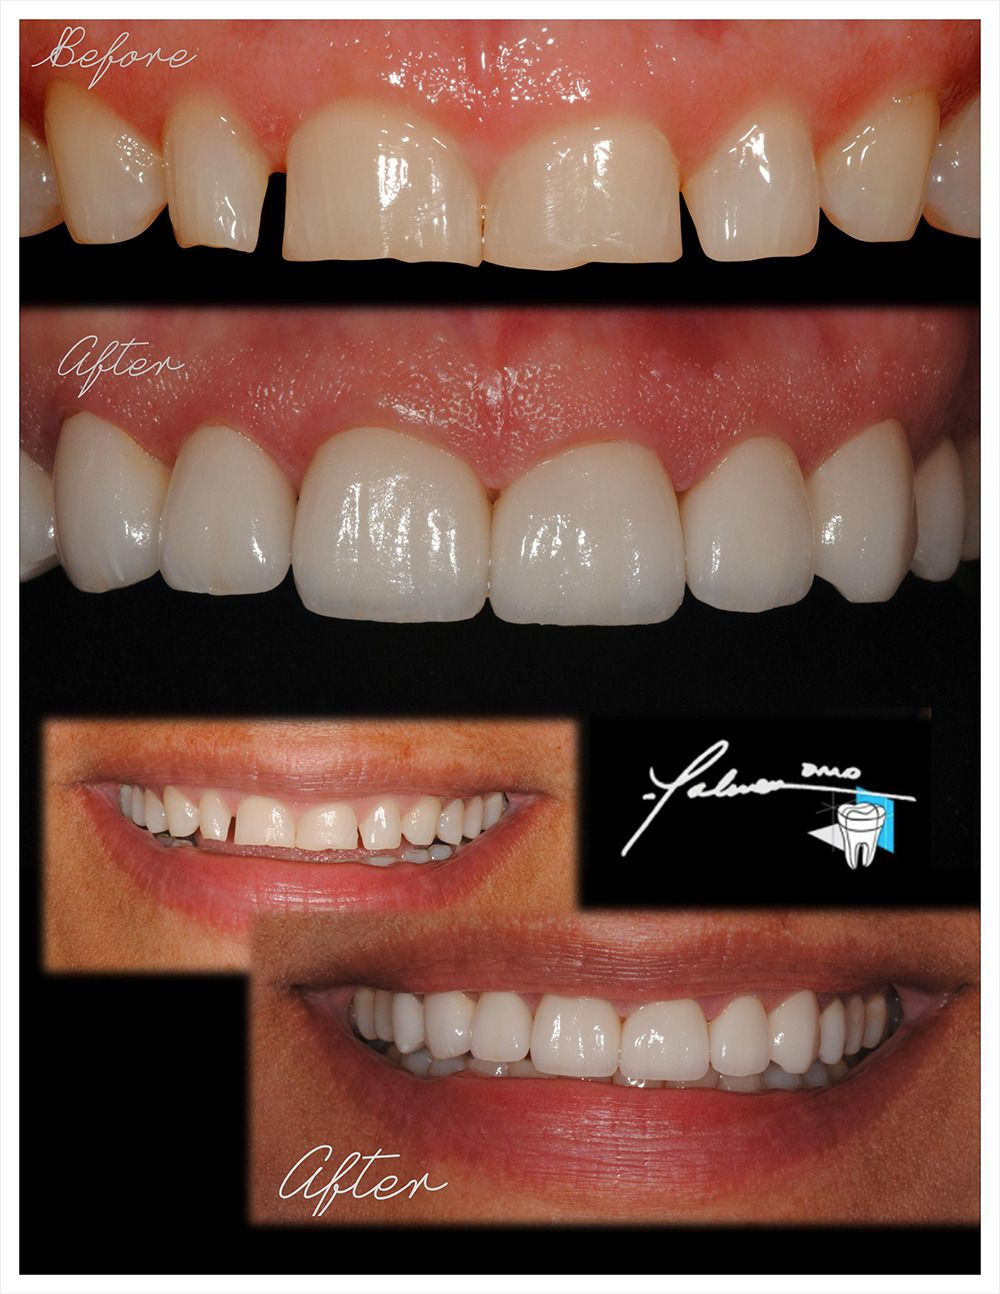 Smile Design Ellsworth Ideal Garden State Dental Design Ka50431